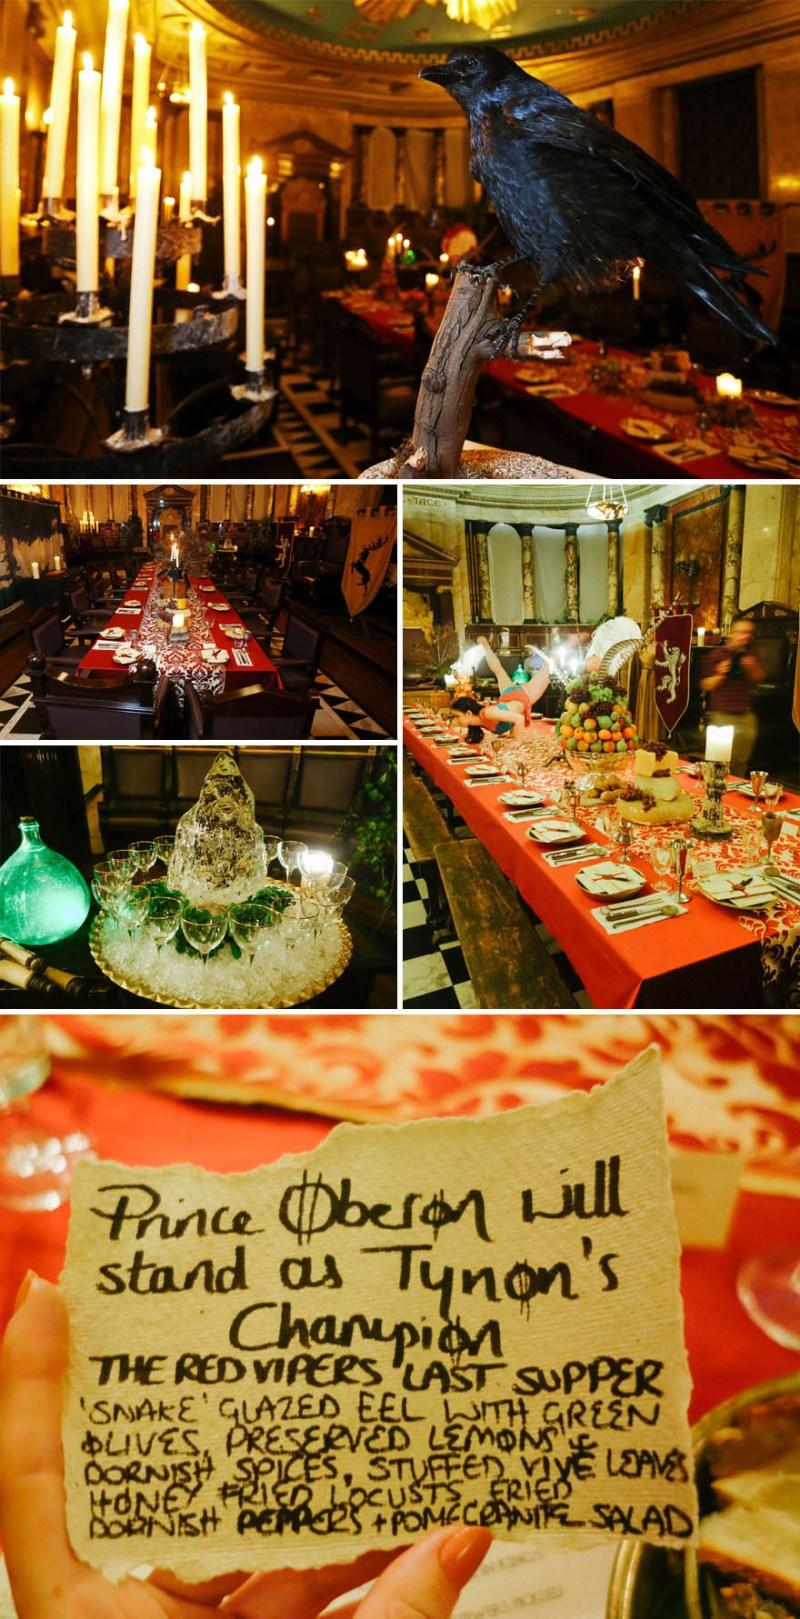 worlds-most-amazing-restaurants-unique-dining-experiences-vinegret-2